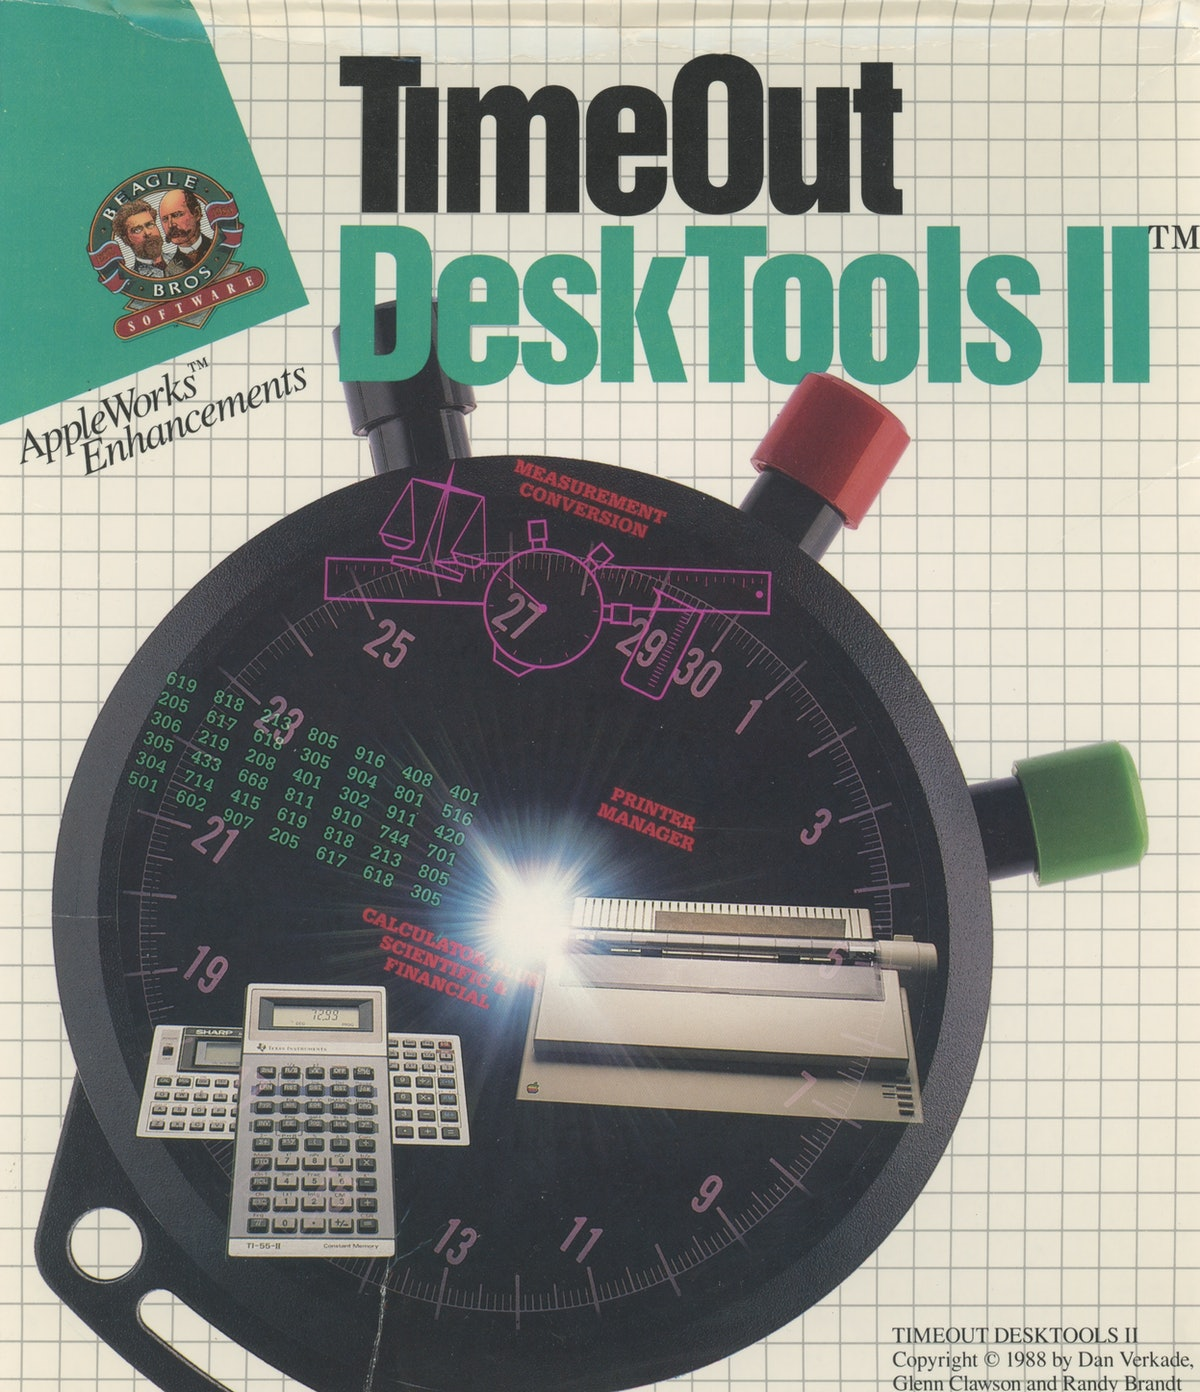 TimeOut: Desktools II